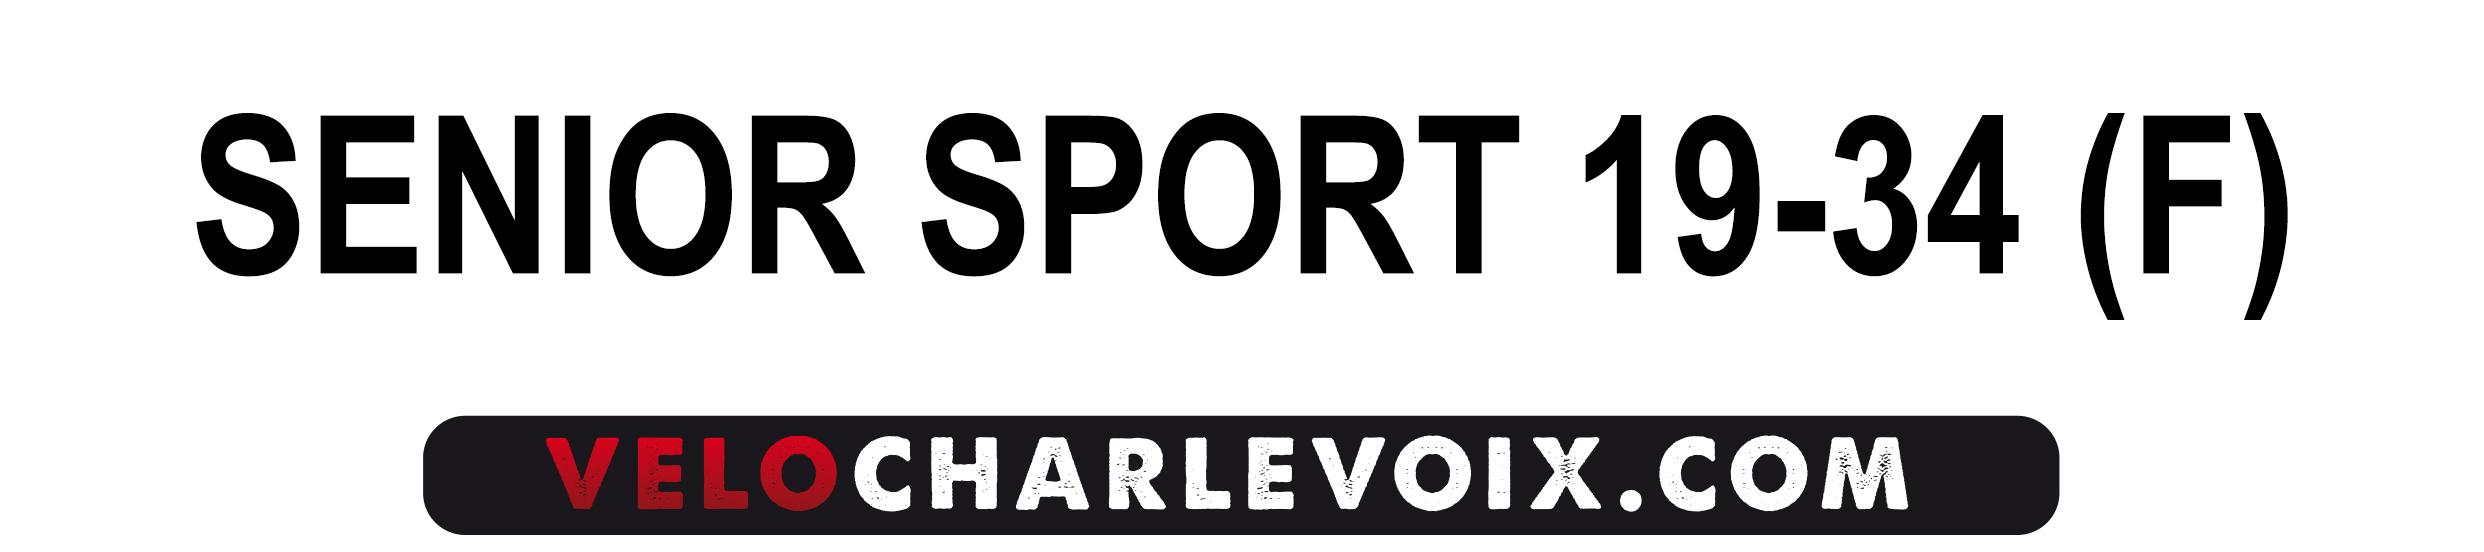 Categories Box Qc_Senior sport 19-34 F